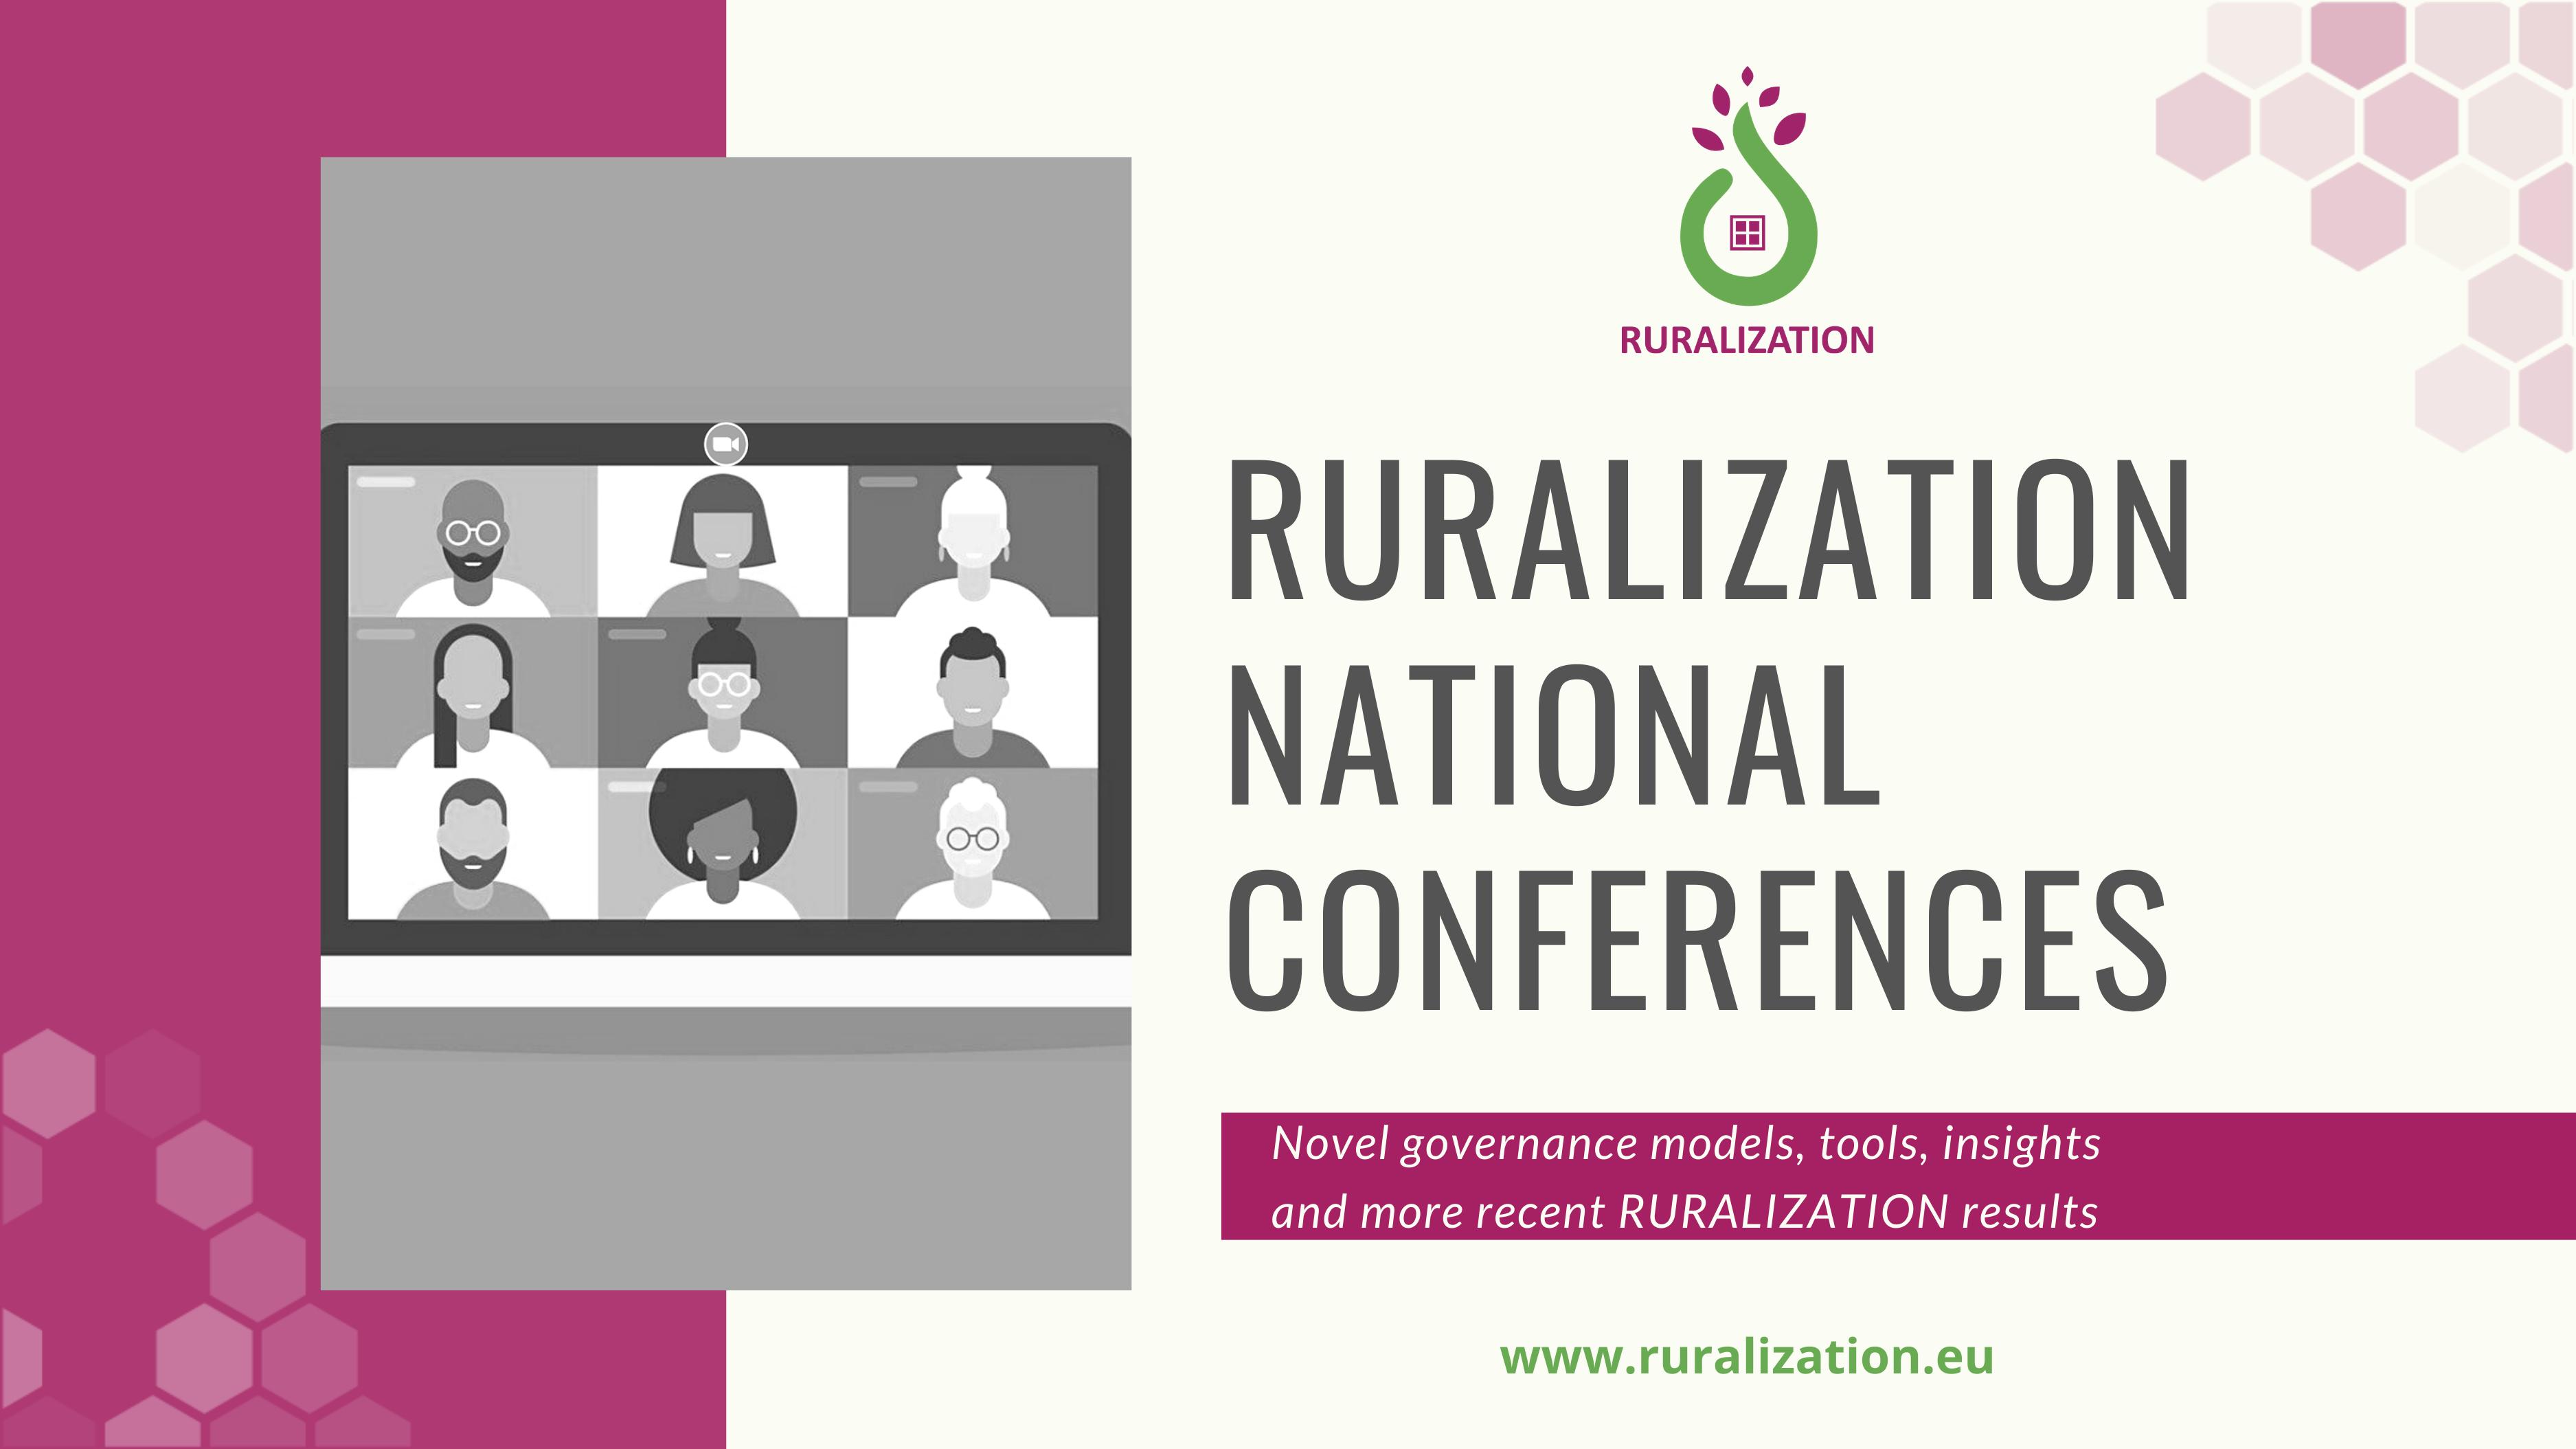 RURALIZATION - National Conferences